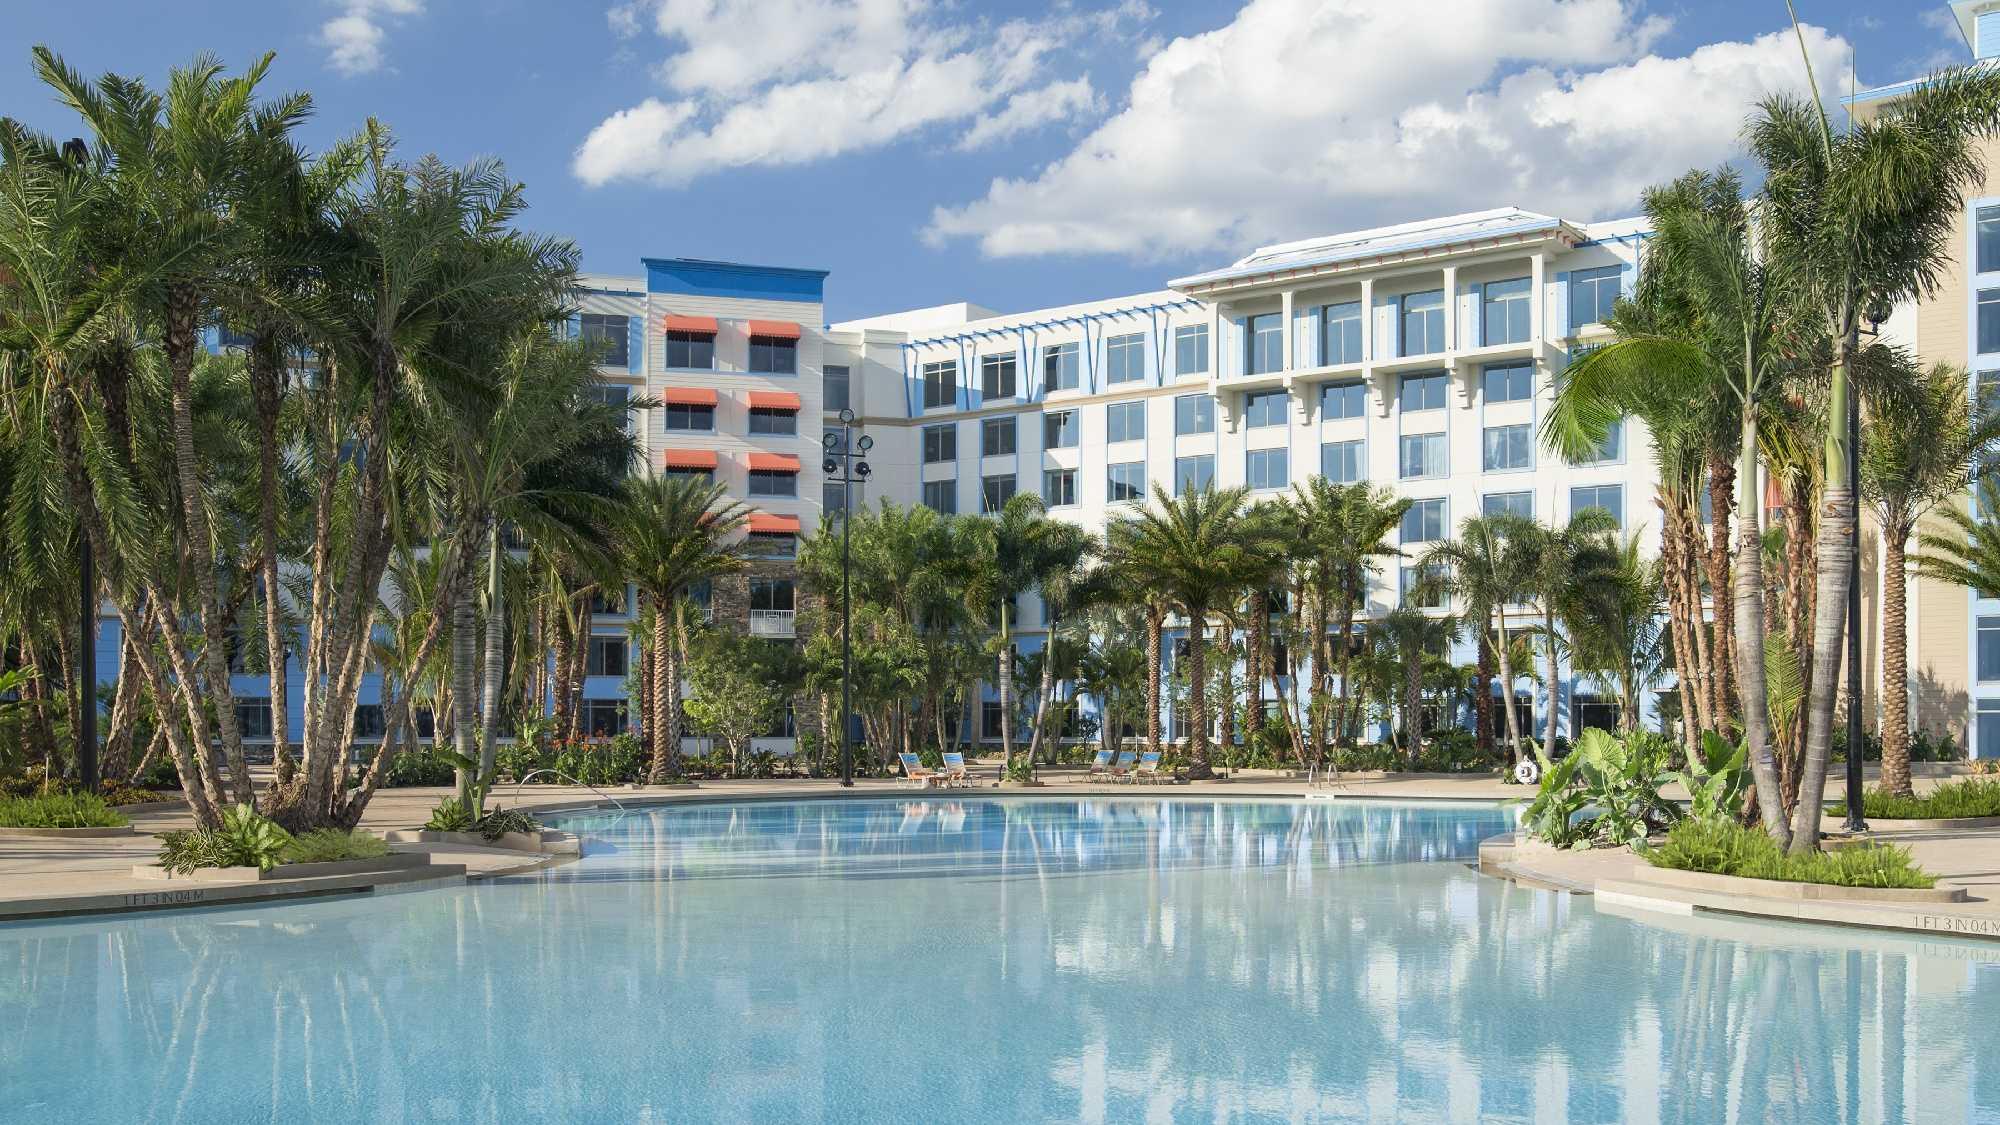 05_Loews Sapphire Falls Resort_Pool Horizontal.jpg